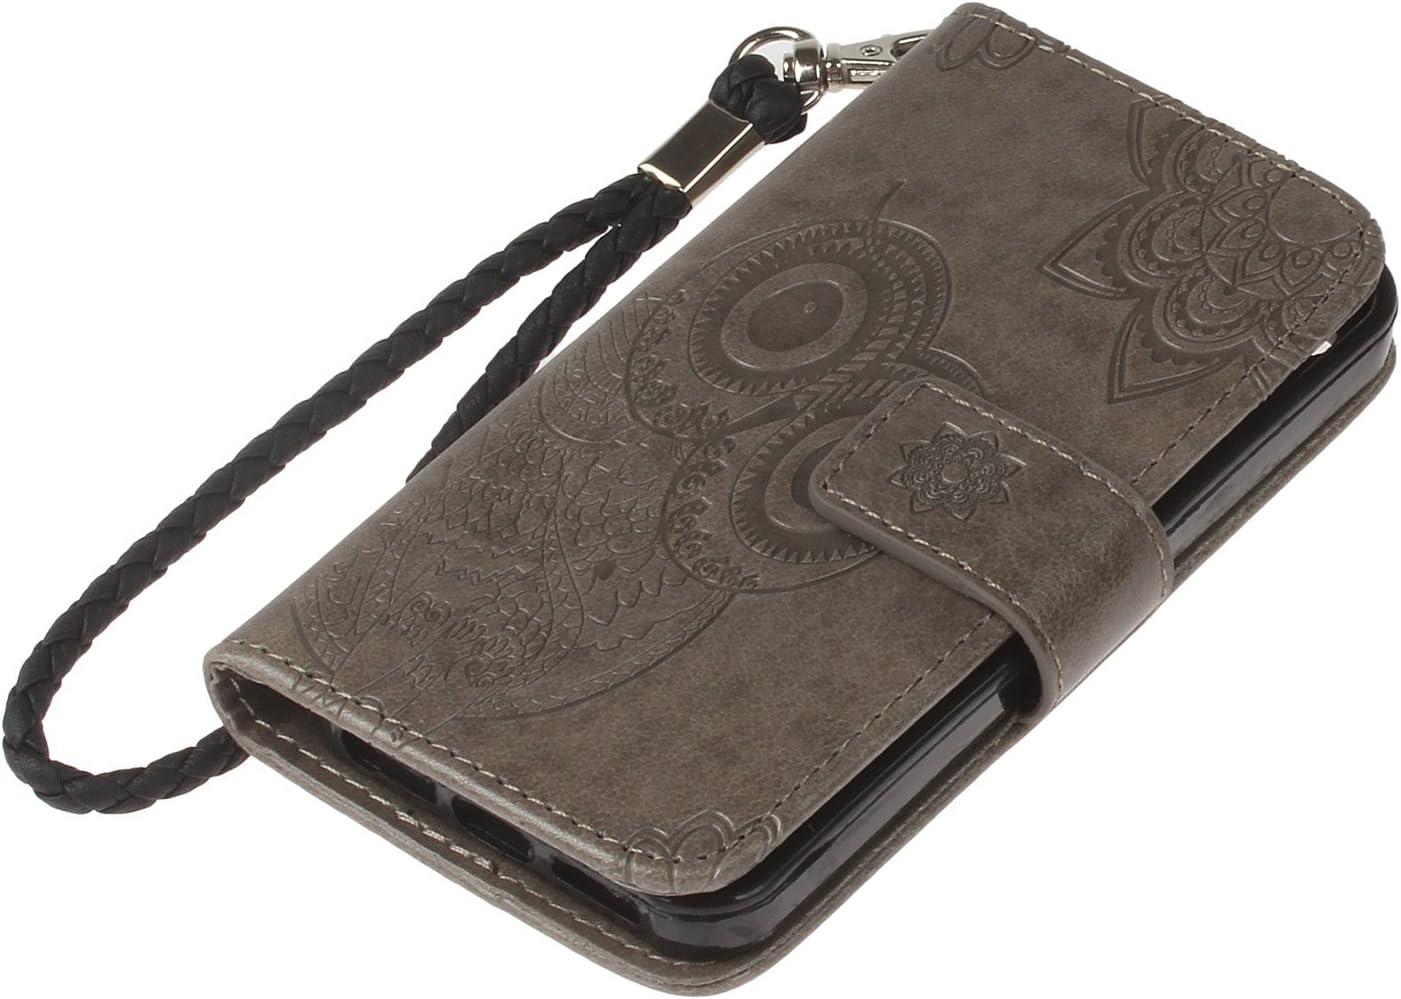 Karomenic PU Leder H/ülle kompatibel mit iPhone SE//5S//5 Pr/ägung Eule Muster Handyh/ülle Brieftasche TPU Silikon Schutzh/ülle Klapph/ülle Magnet Ledertasche Wallet Flip Case Etui,Rosa